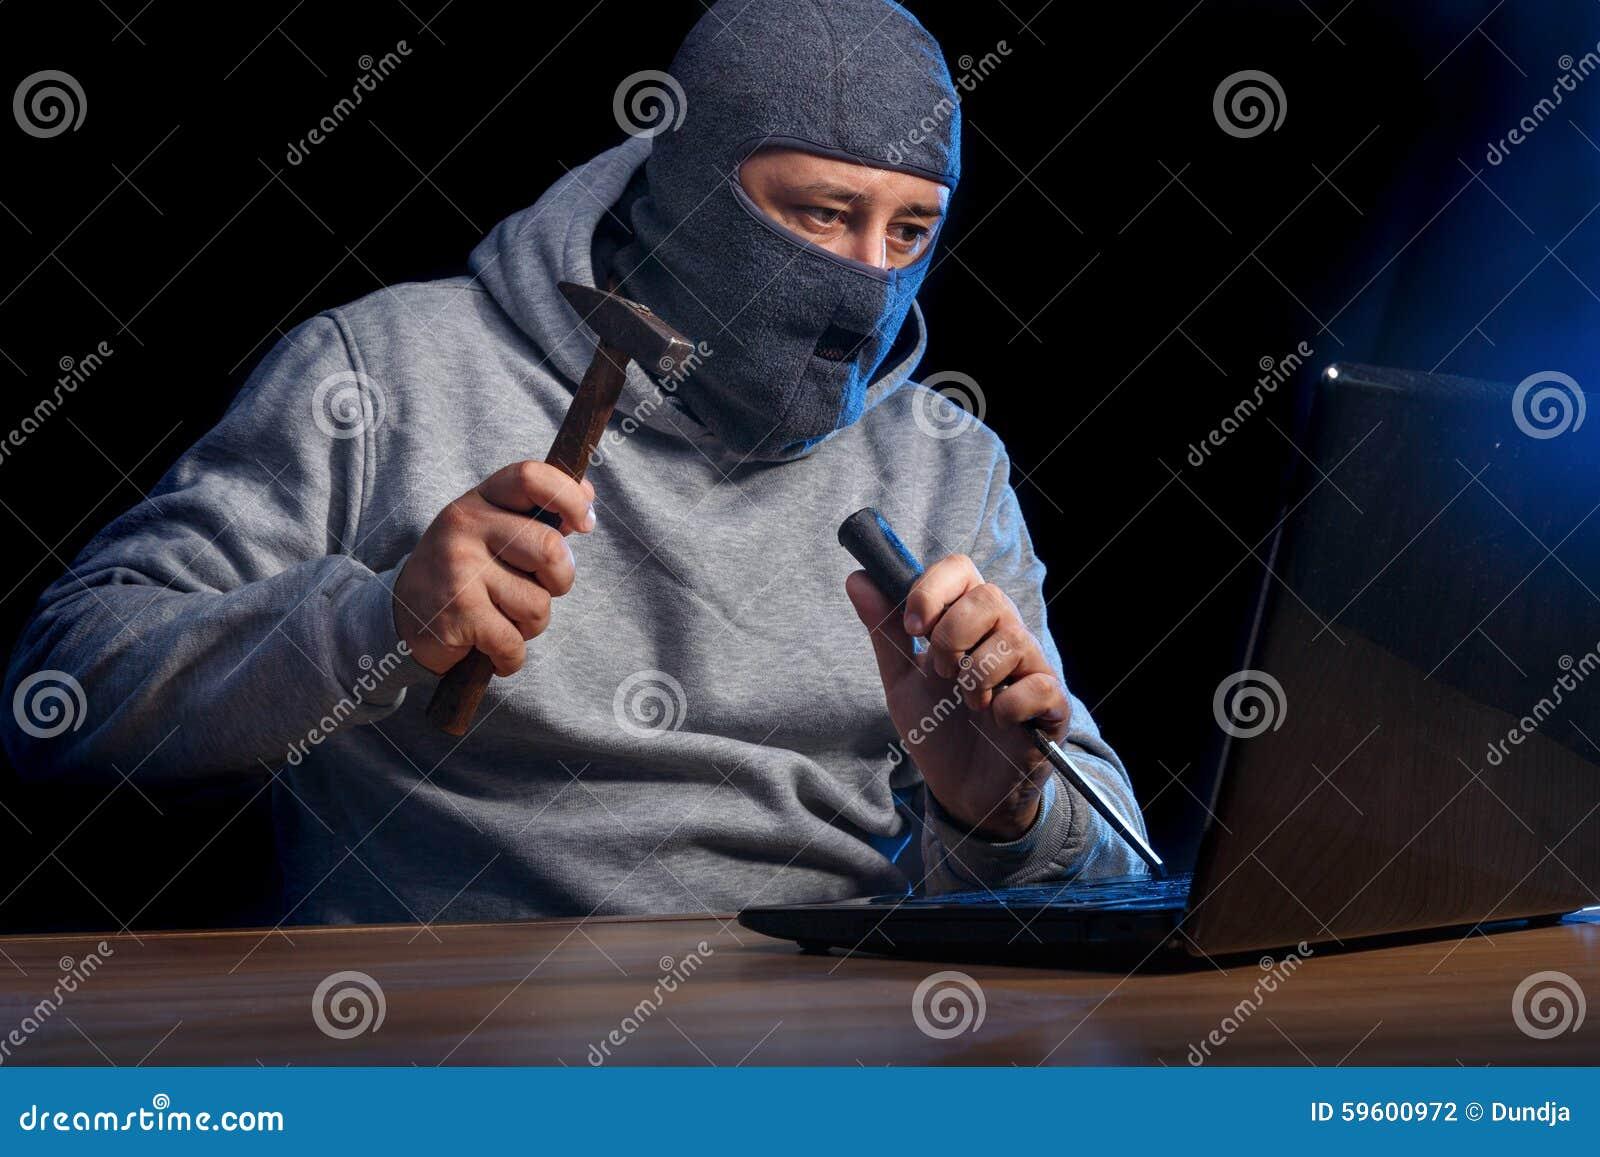 cyber crime stock photo image of cracker electronic 59600972